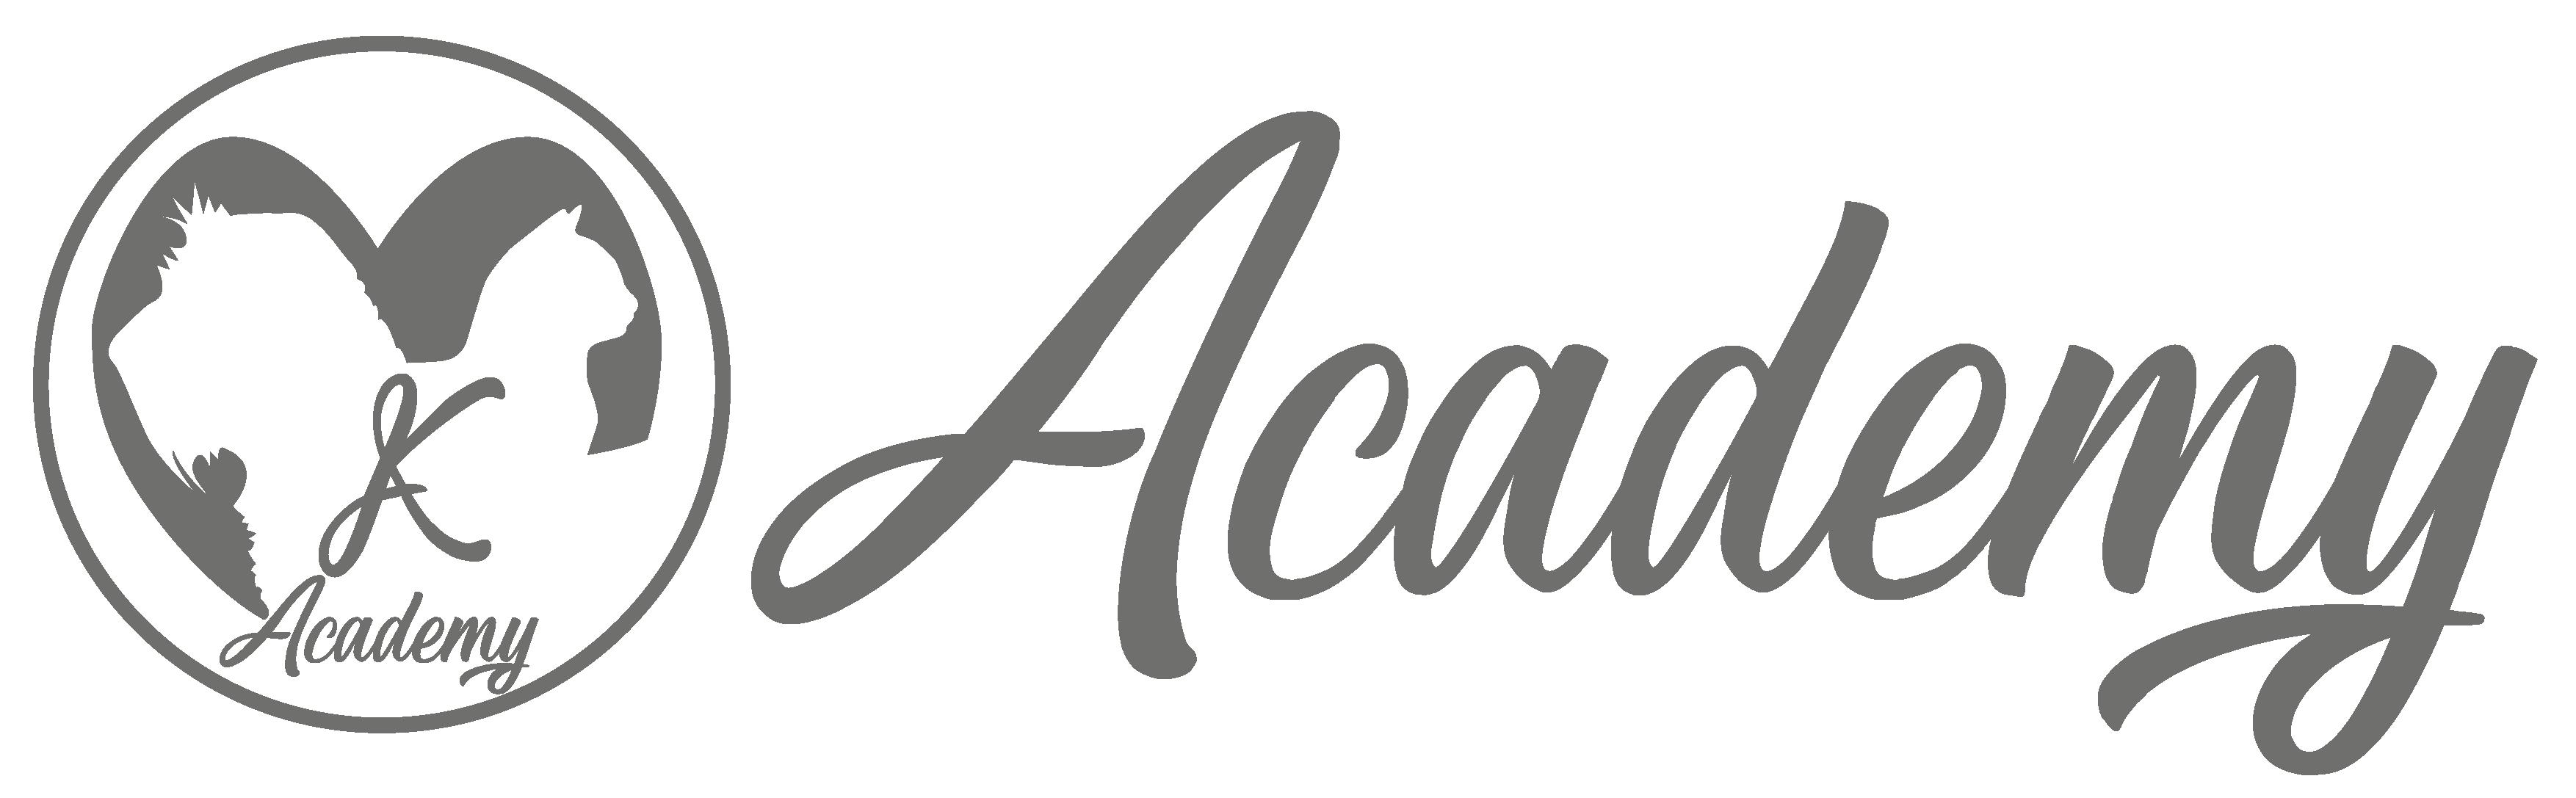 Academy large-01